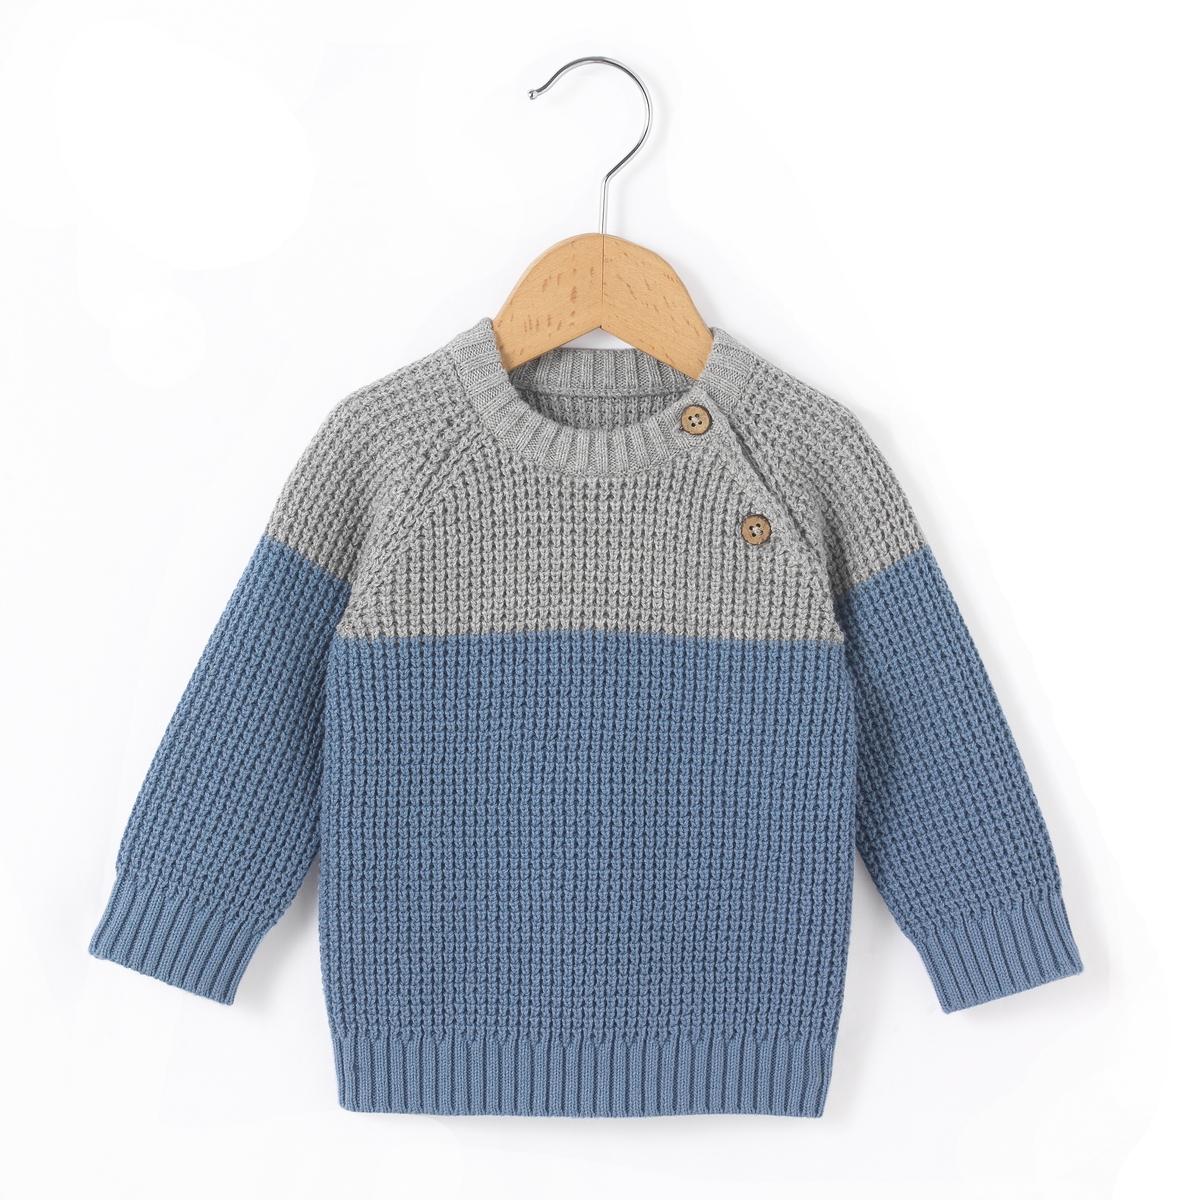 Пуловер двухцветный, 1 мес. – 3 года